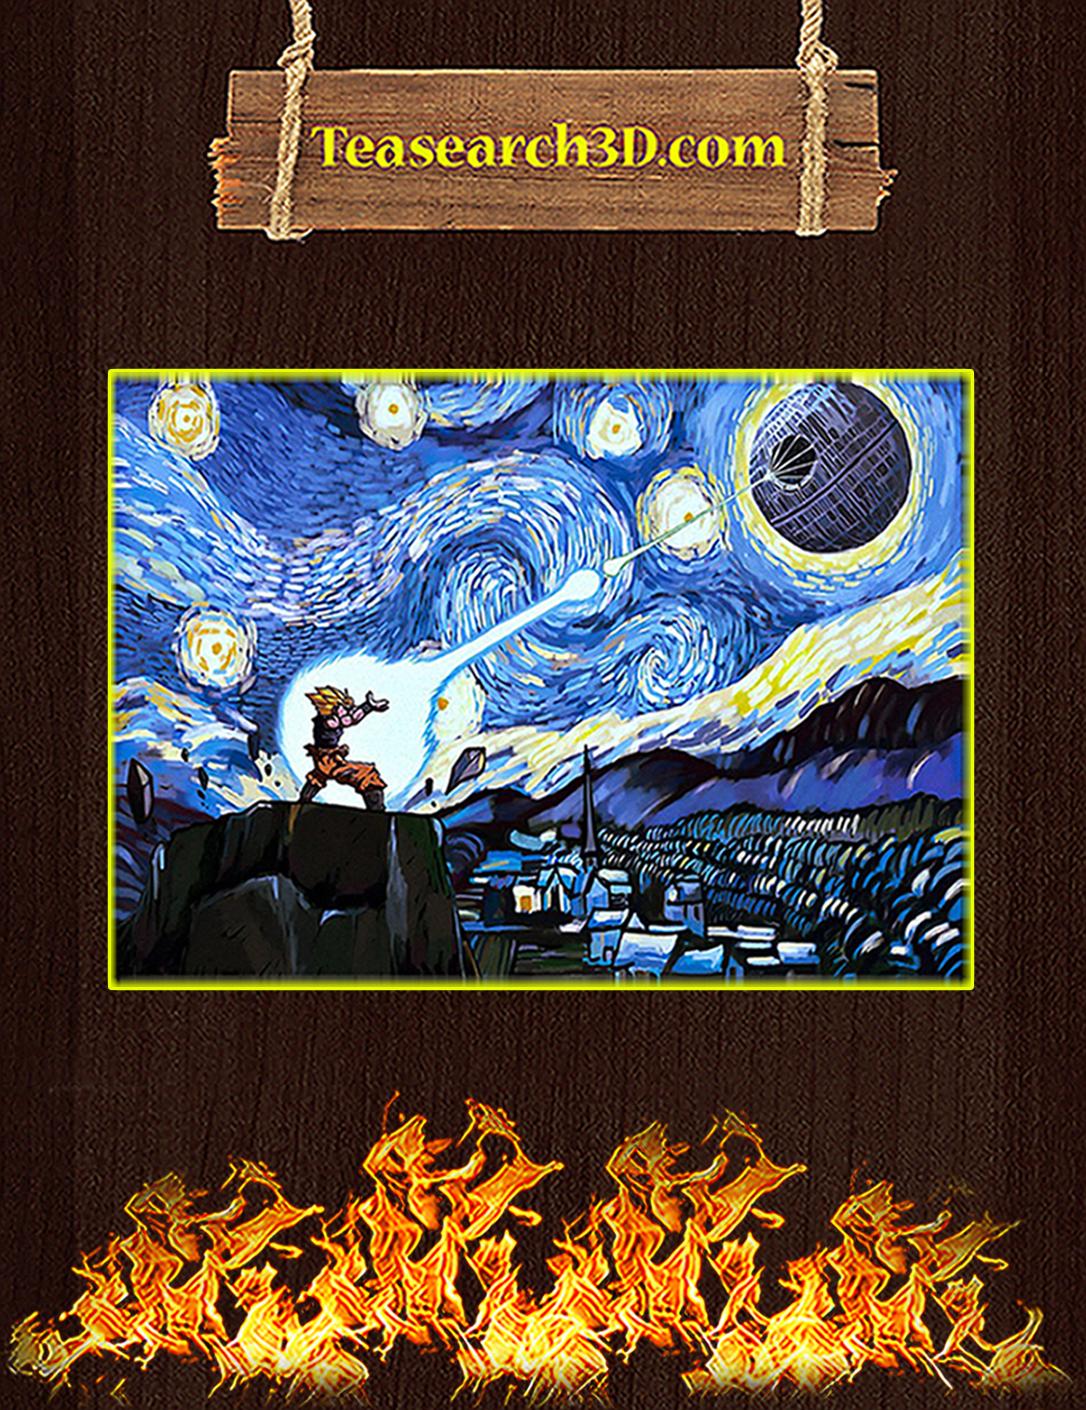 Goku vs Death Star starry night van gogh poster A2